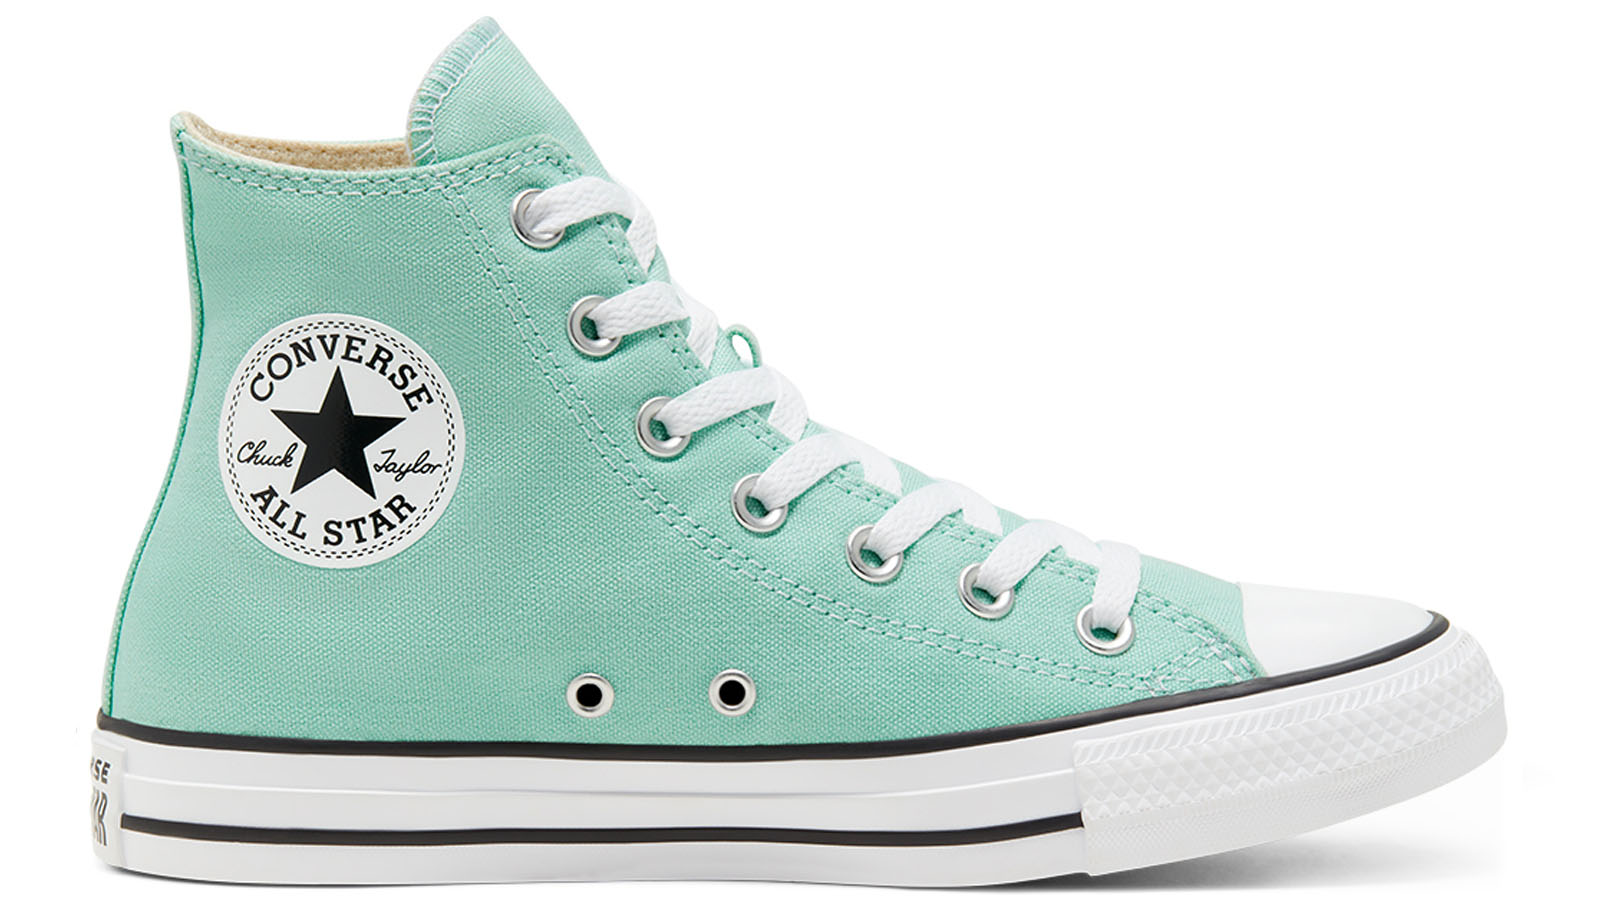 converse high top green